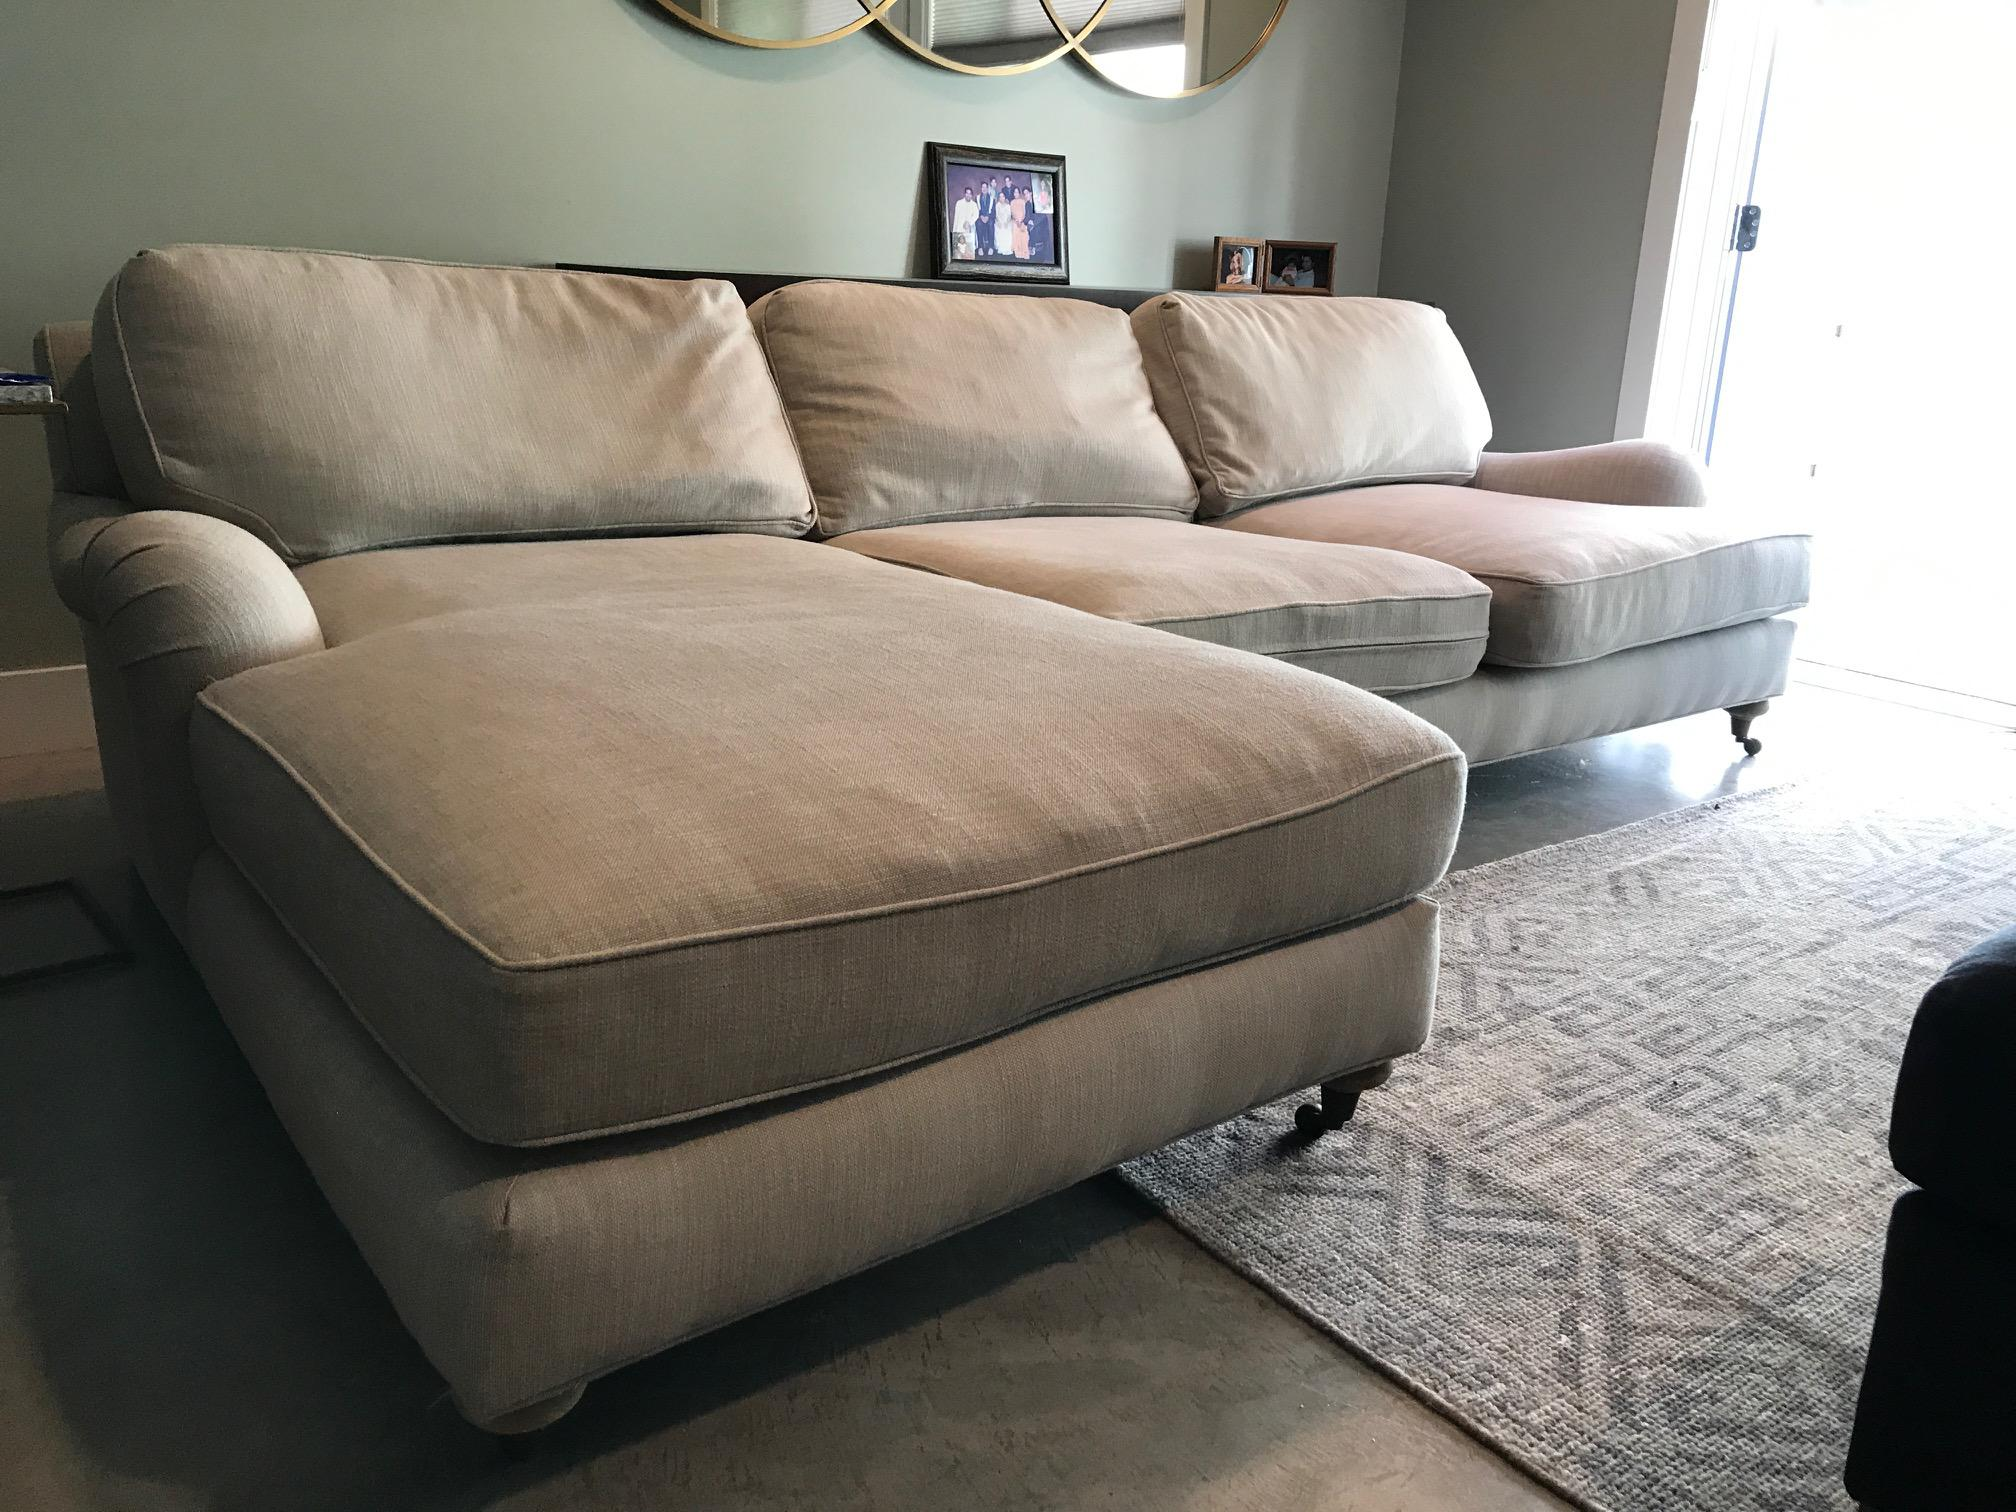 Restoration Hardware Sectional Sofa   Image 6 Of 9